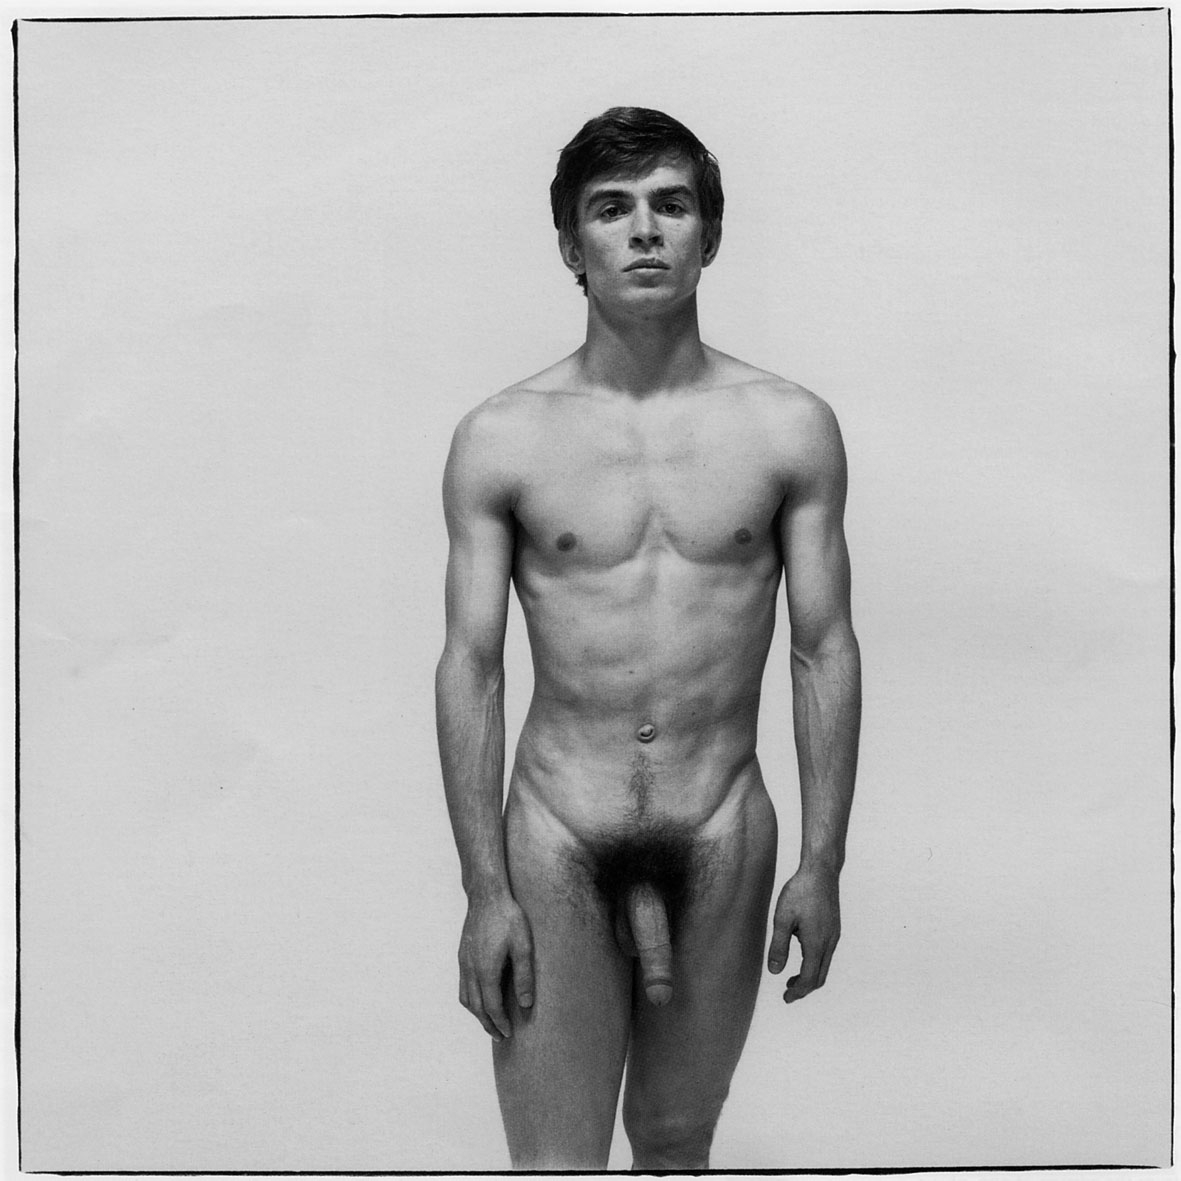 Billie joe armstrong naked